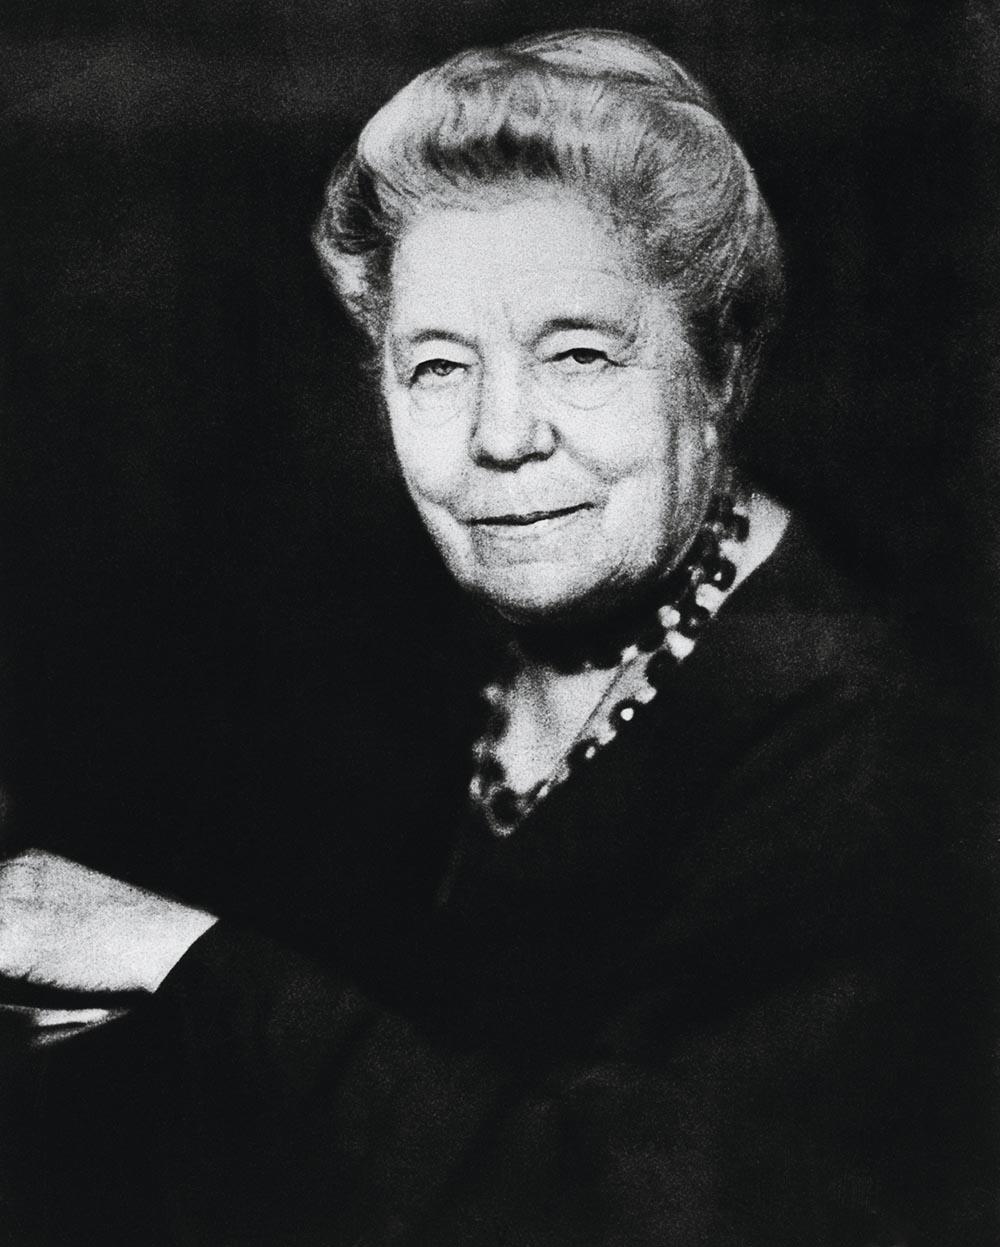 Lagerlцf, Selma schwed. Schriftstellerin, 1909 Nobelpreis fьr Literatur, Marbacka, Vдrmland 20.11.1858 Ц ebd. 16.3.1940. Portrдtaufnahme, um 1925.